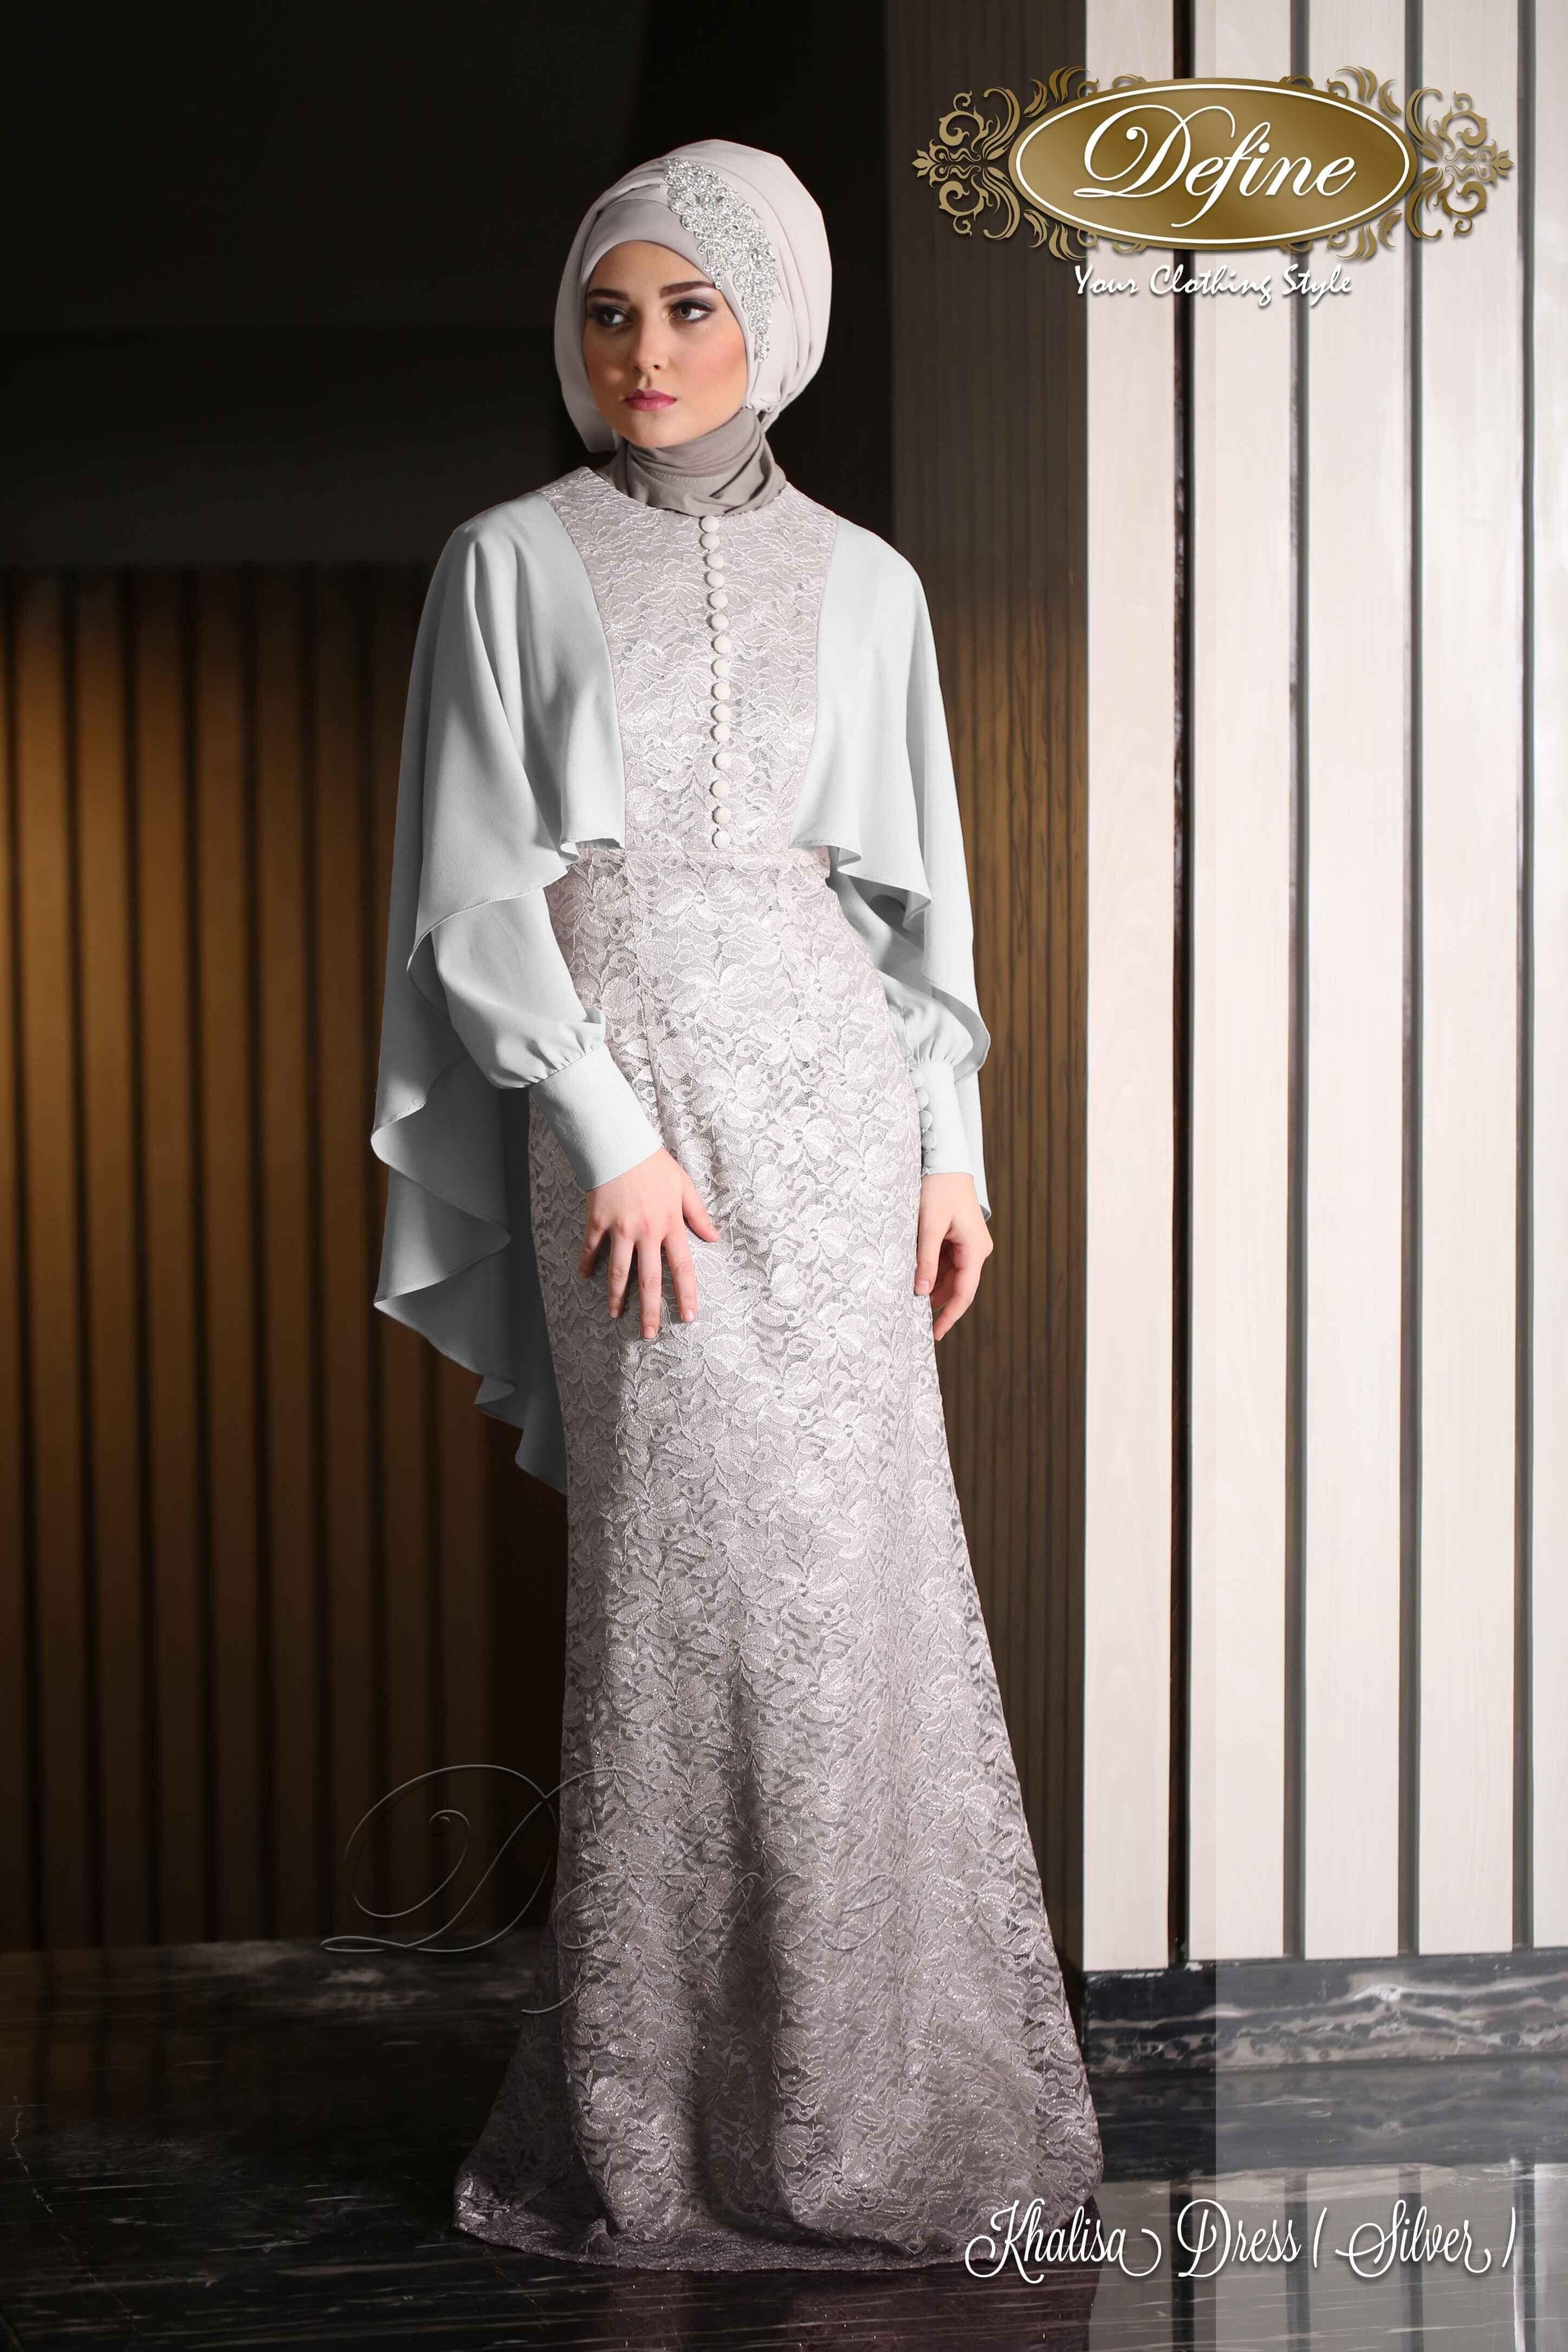 Khalisa Dress Gamis Pesta Mewah Yang Elegan nan Syarui şüheda